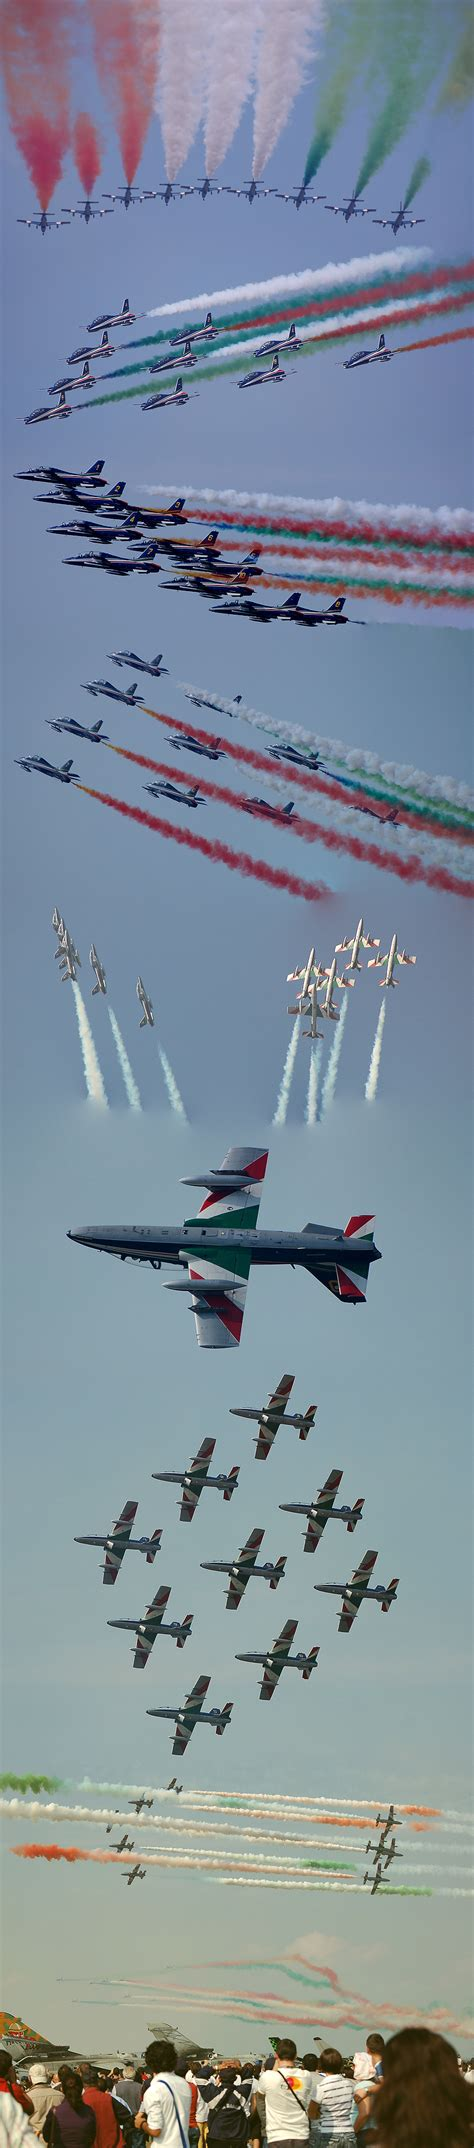 cameri aeronautica air show cameri